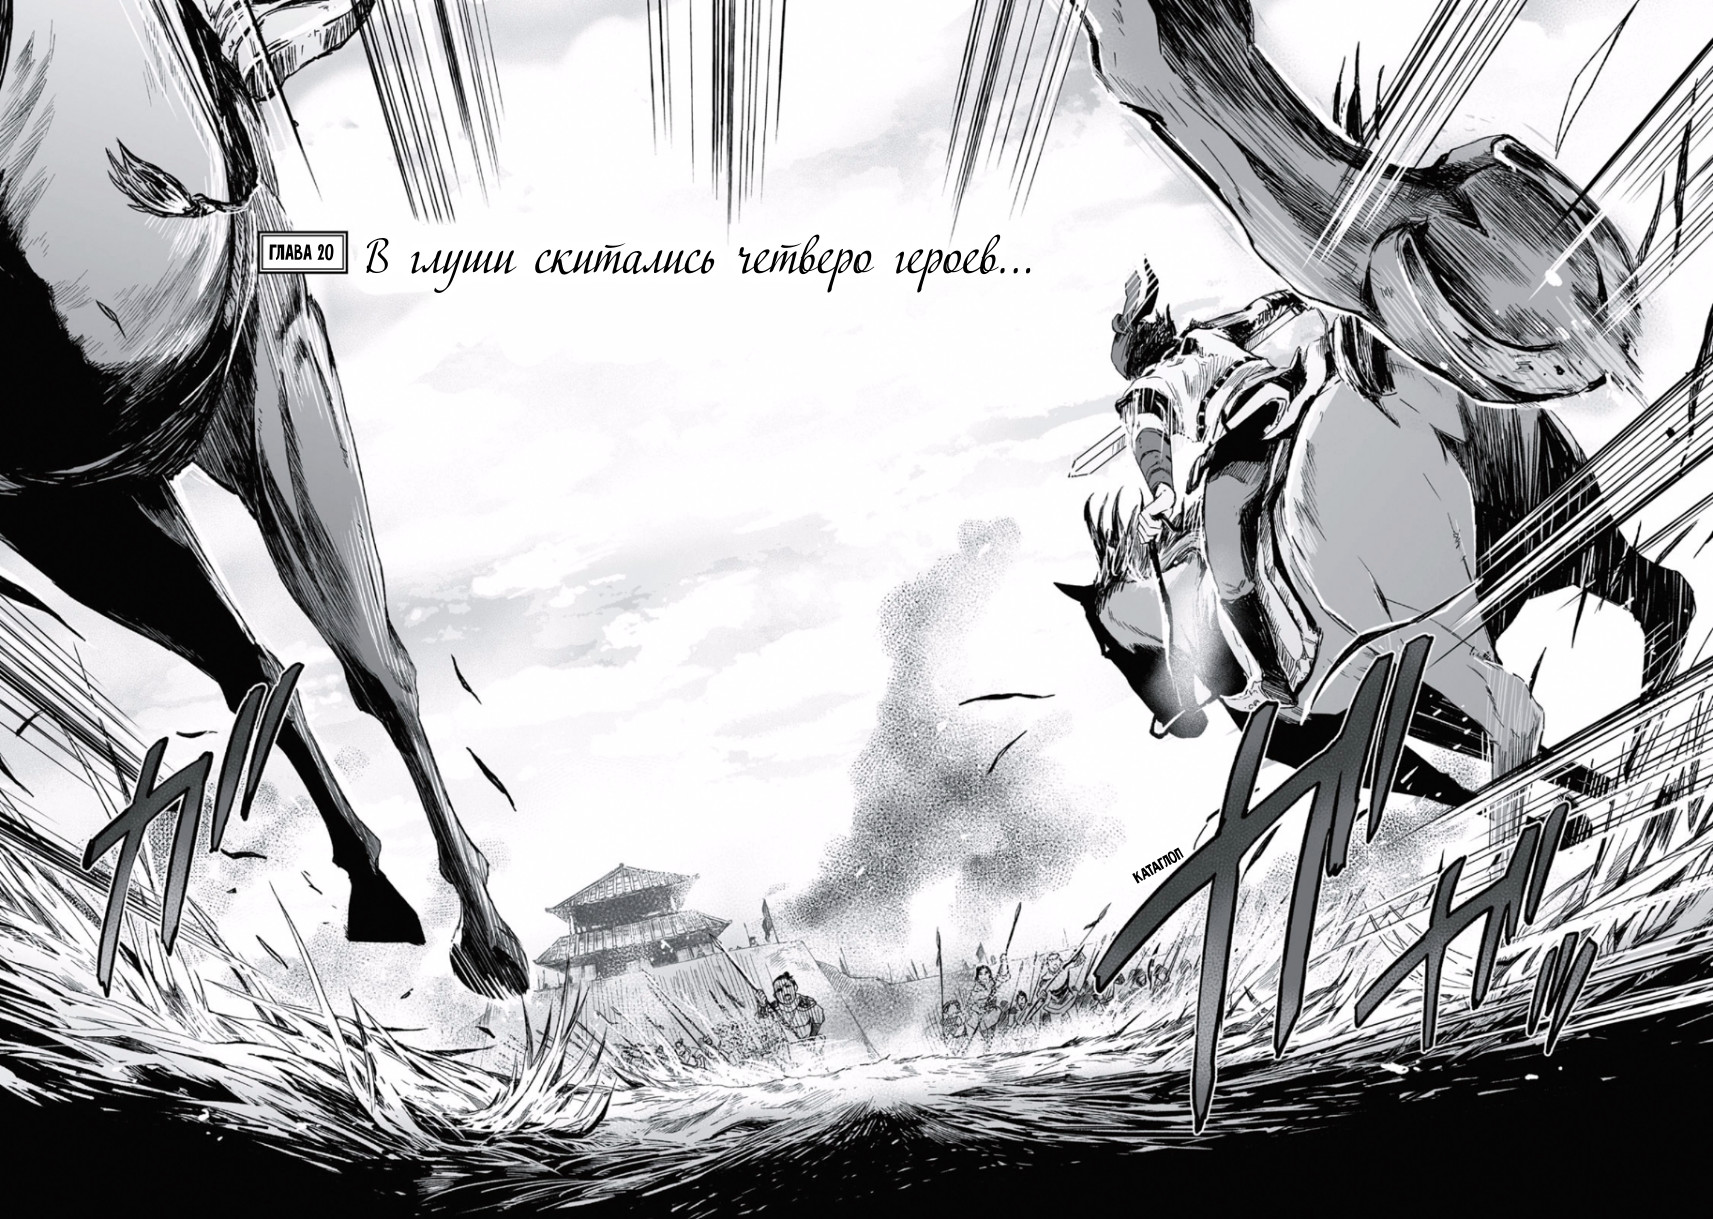 https://r1.ninemanga.com/comics/pic2/16/26832/322519/149178058047.jpg Page 3